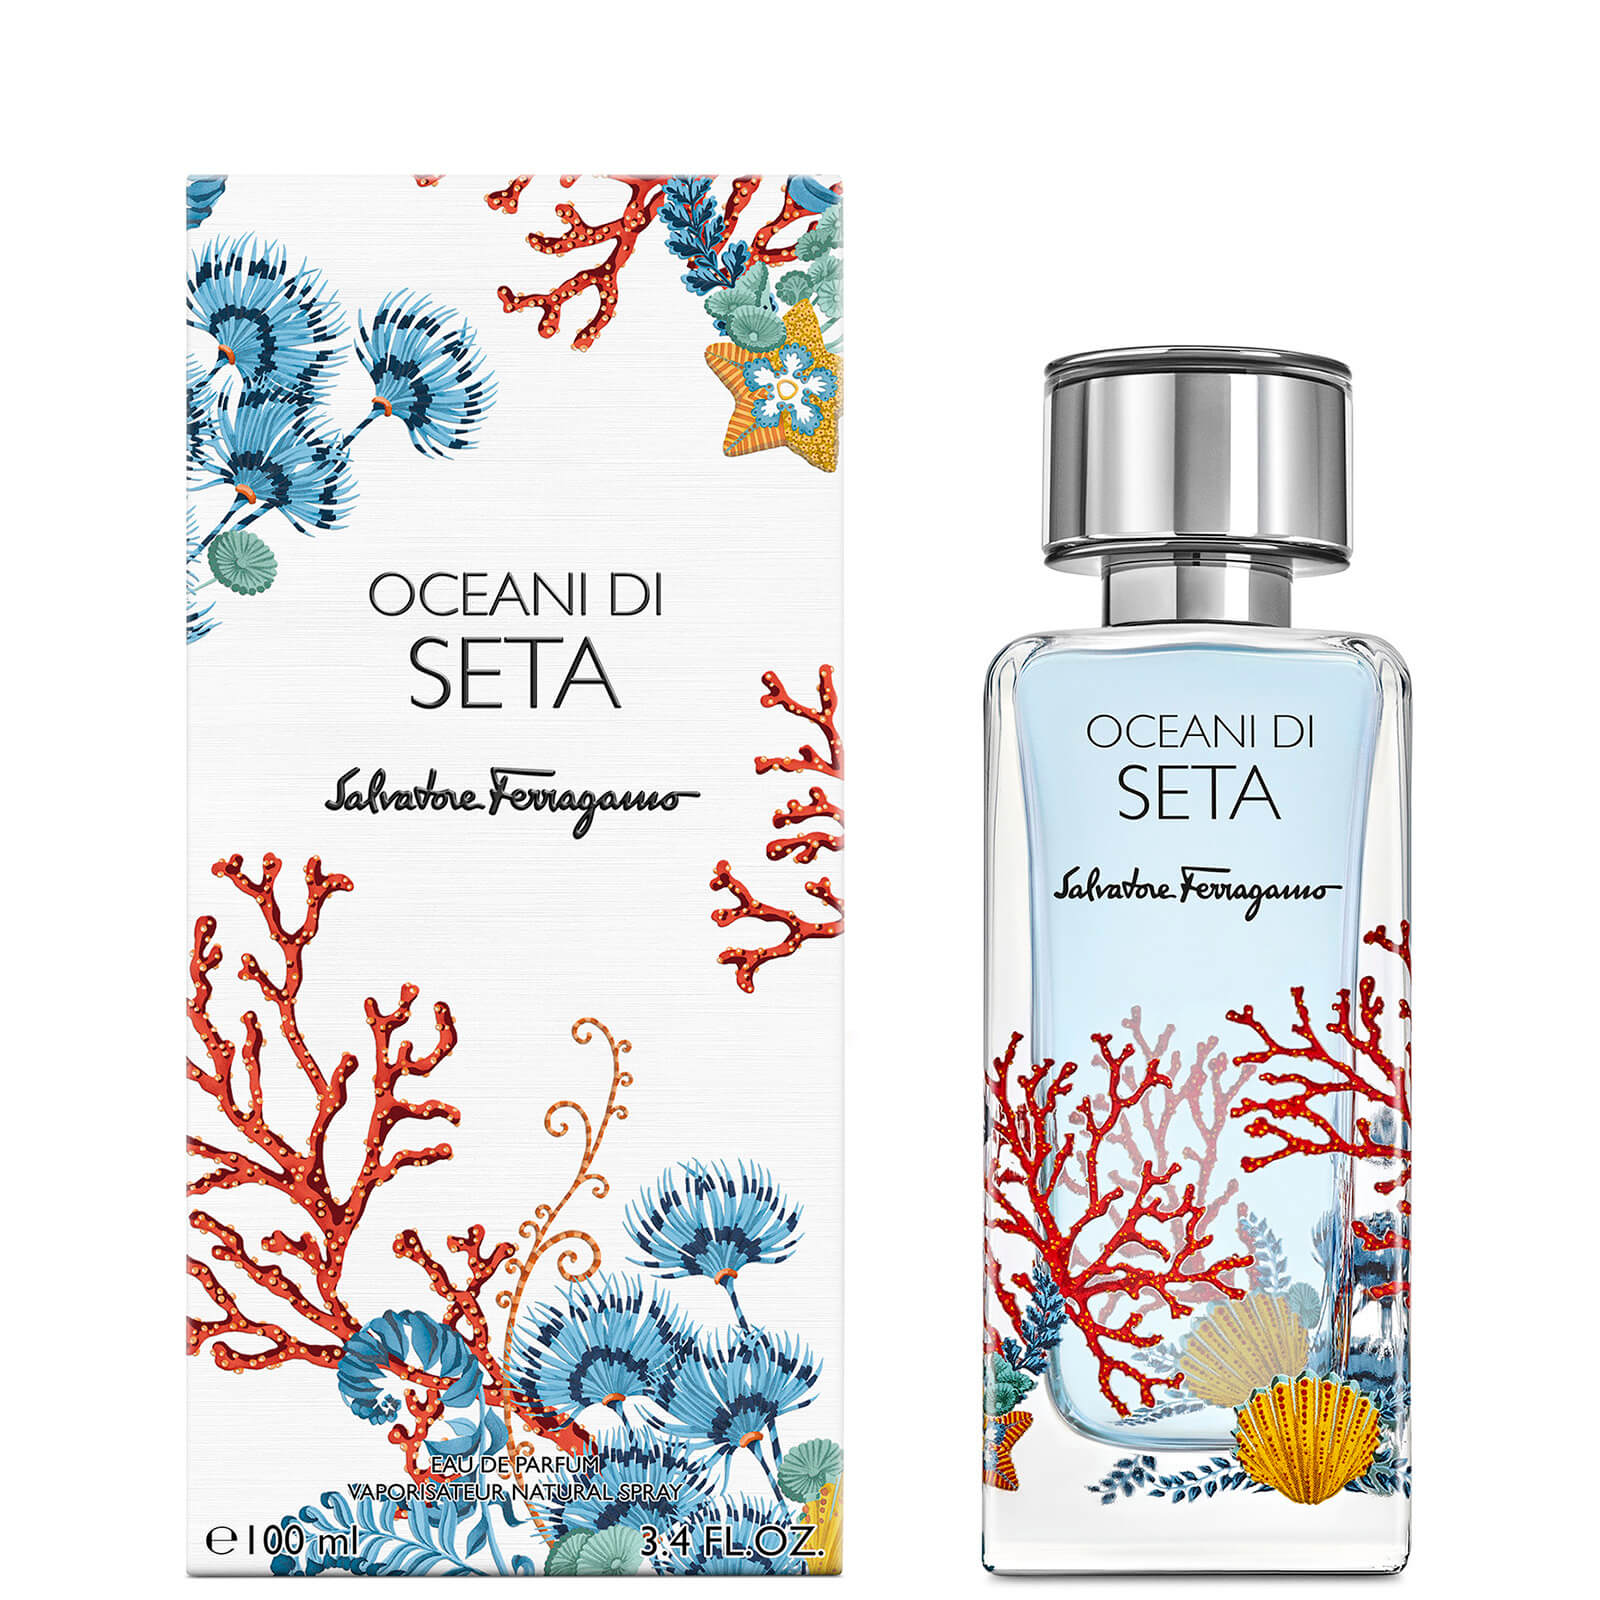 Image of Eau de Parfum Storie Oceane Di Seta Salvatore Ferragamo 100ml